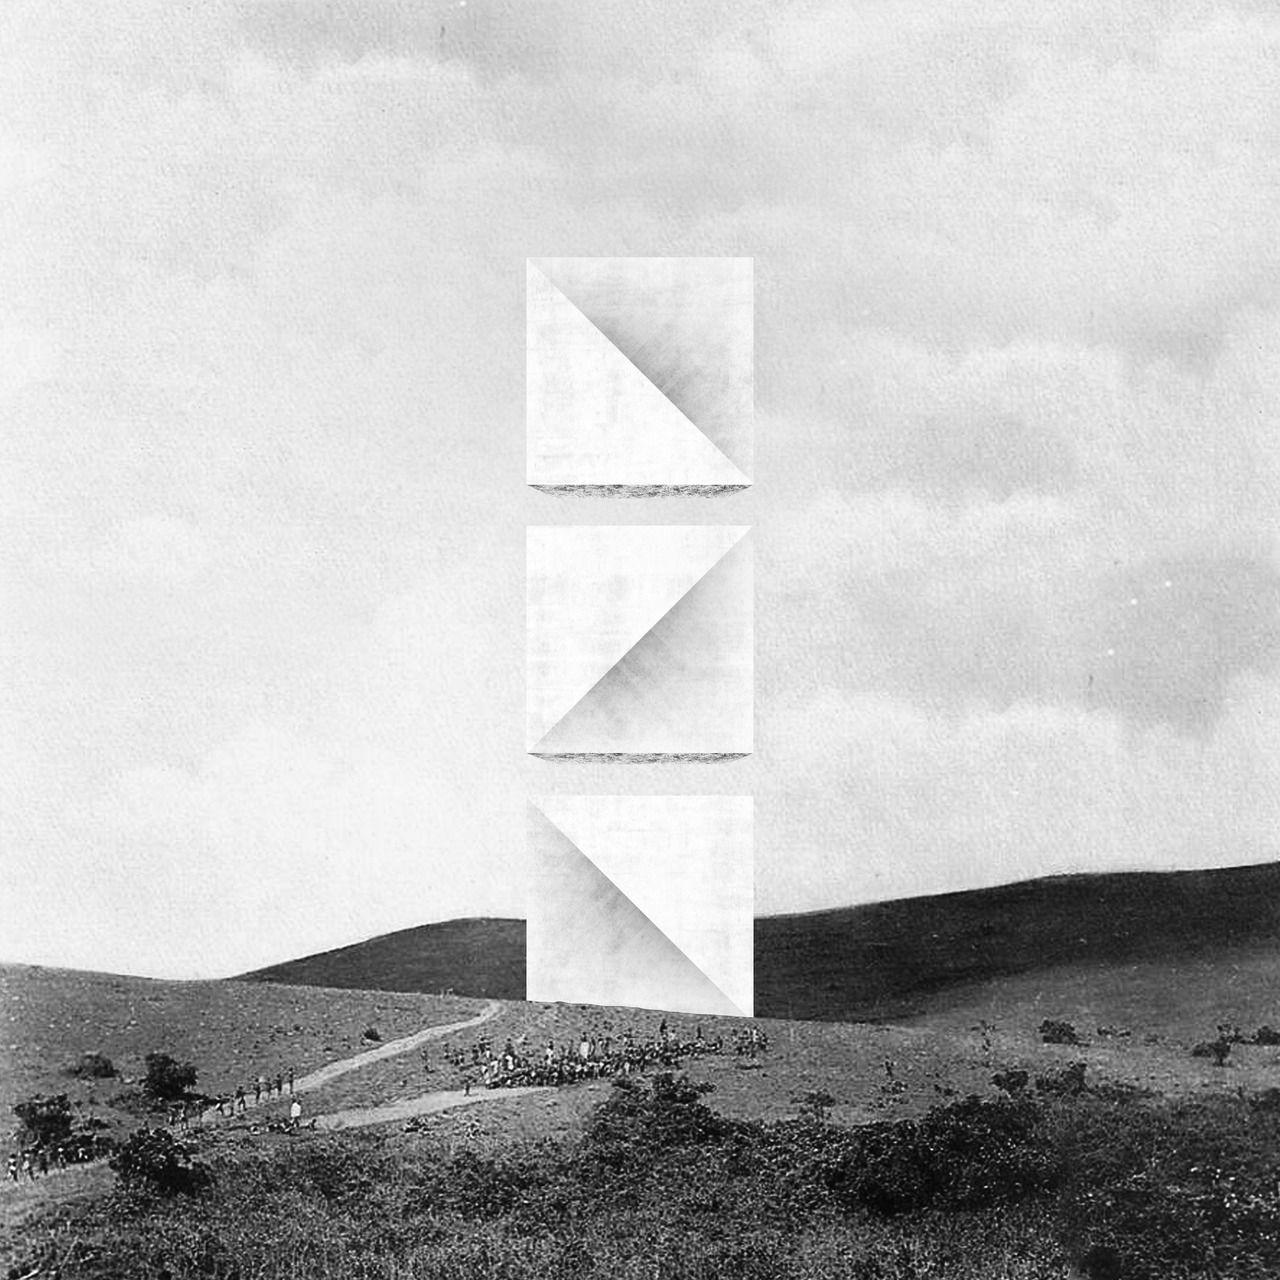 Archive Superlith Seven Miles Gertler 2013 Rwanda 1910